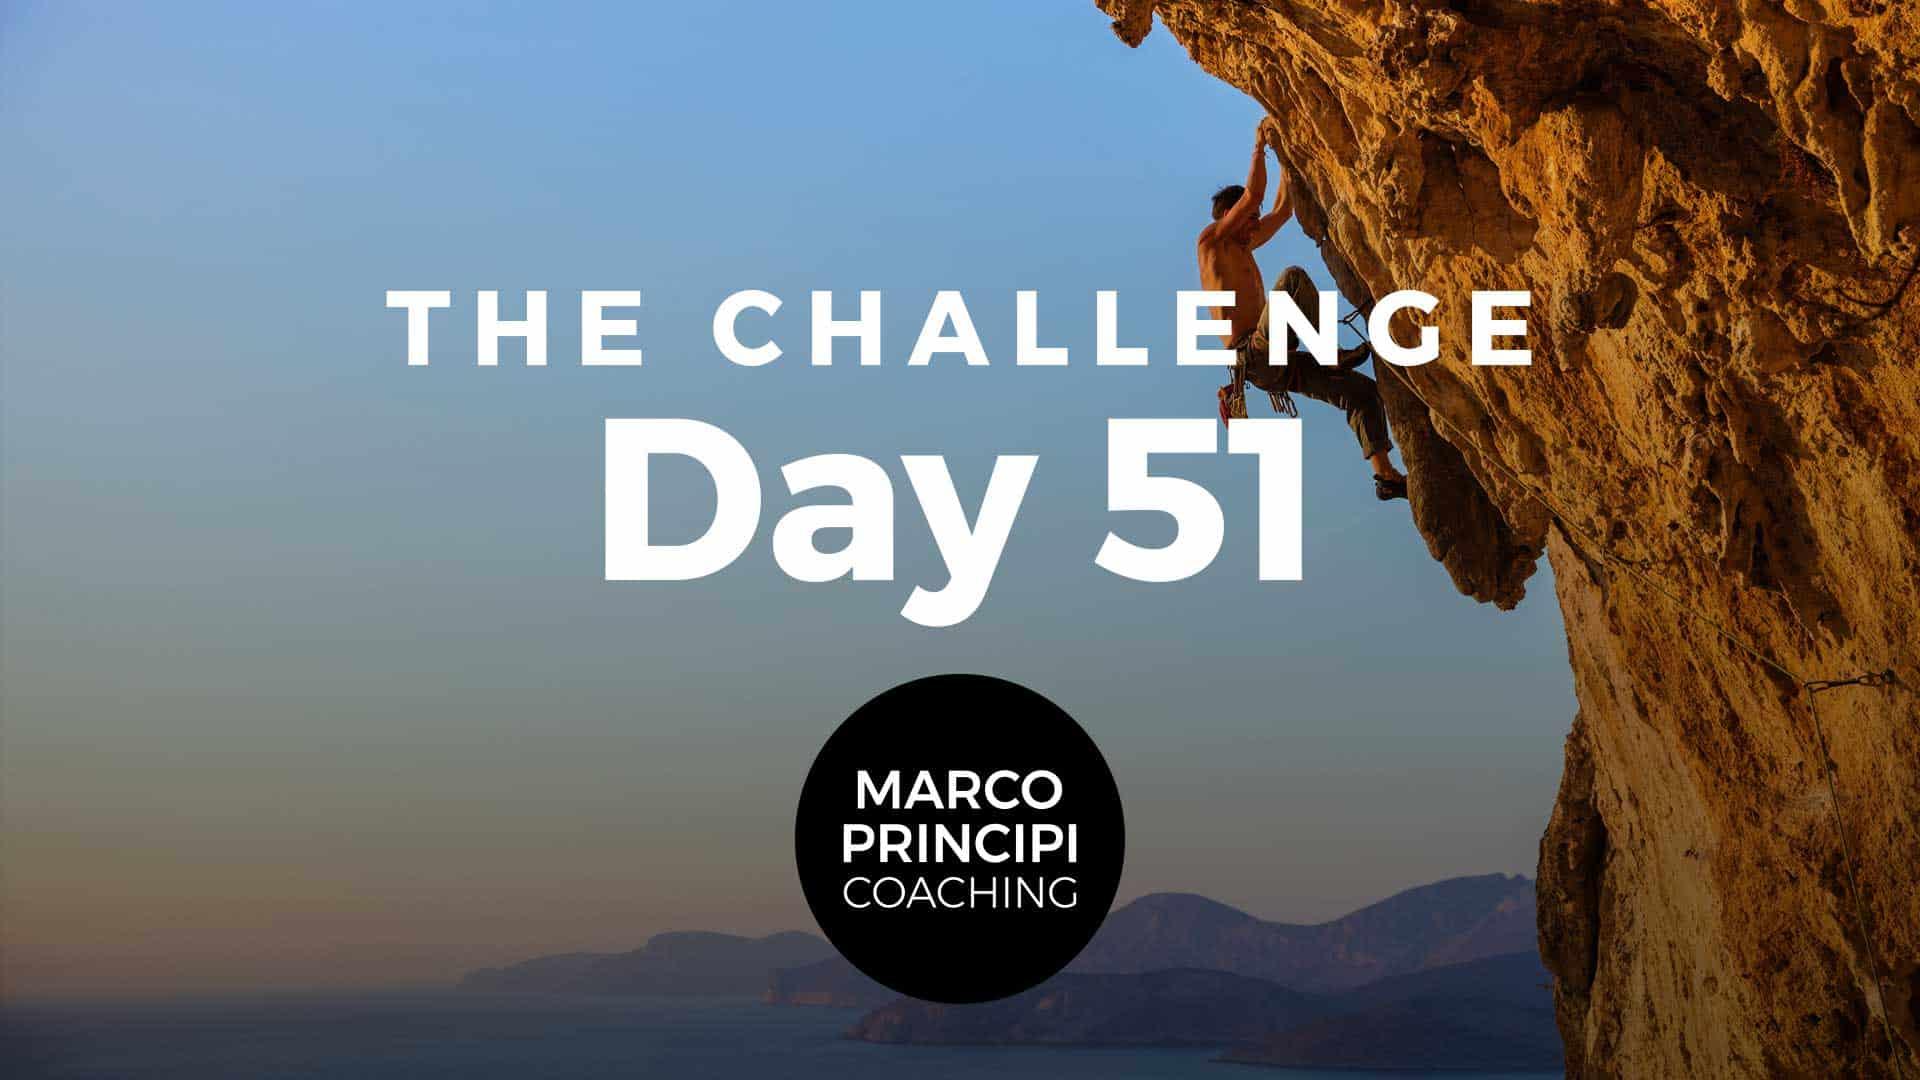 Marco Principi The Challenge Day 51